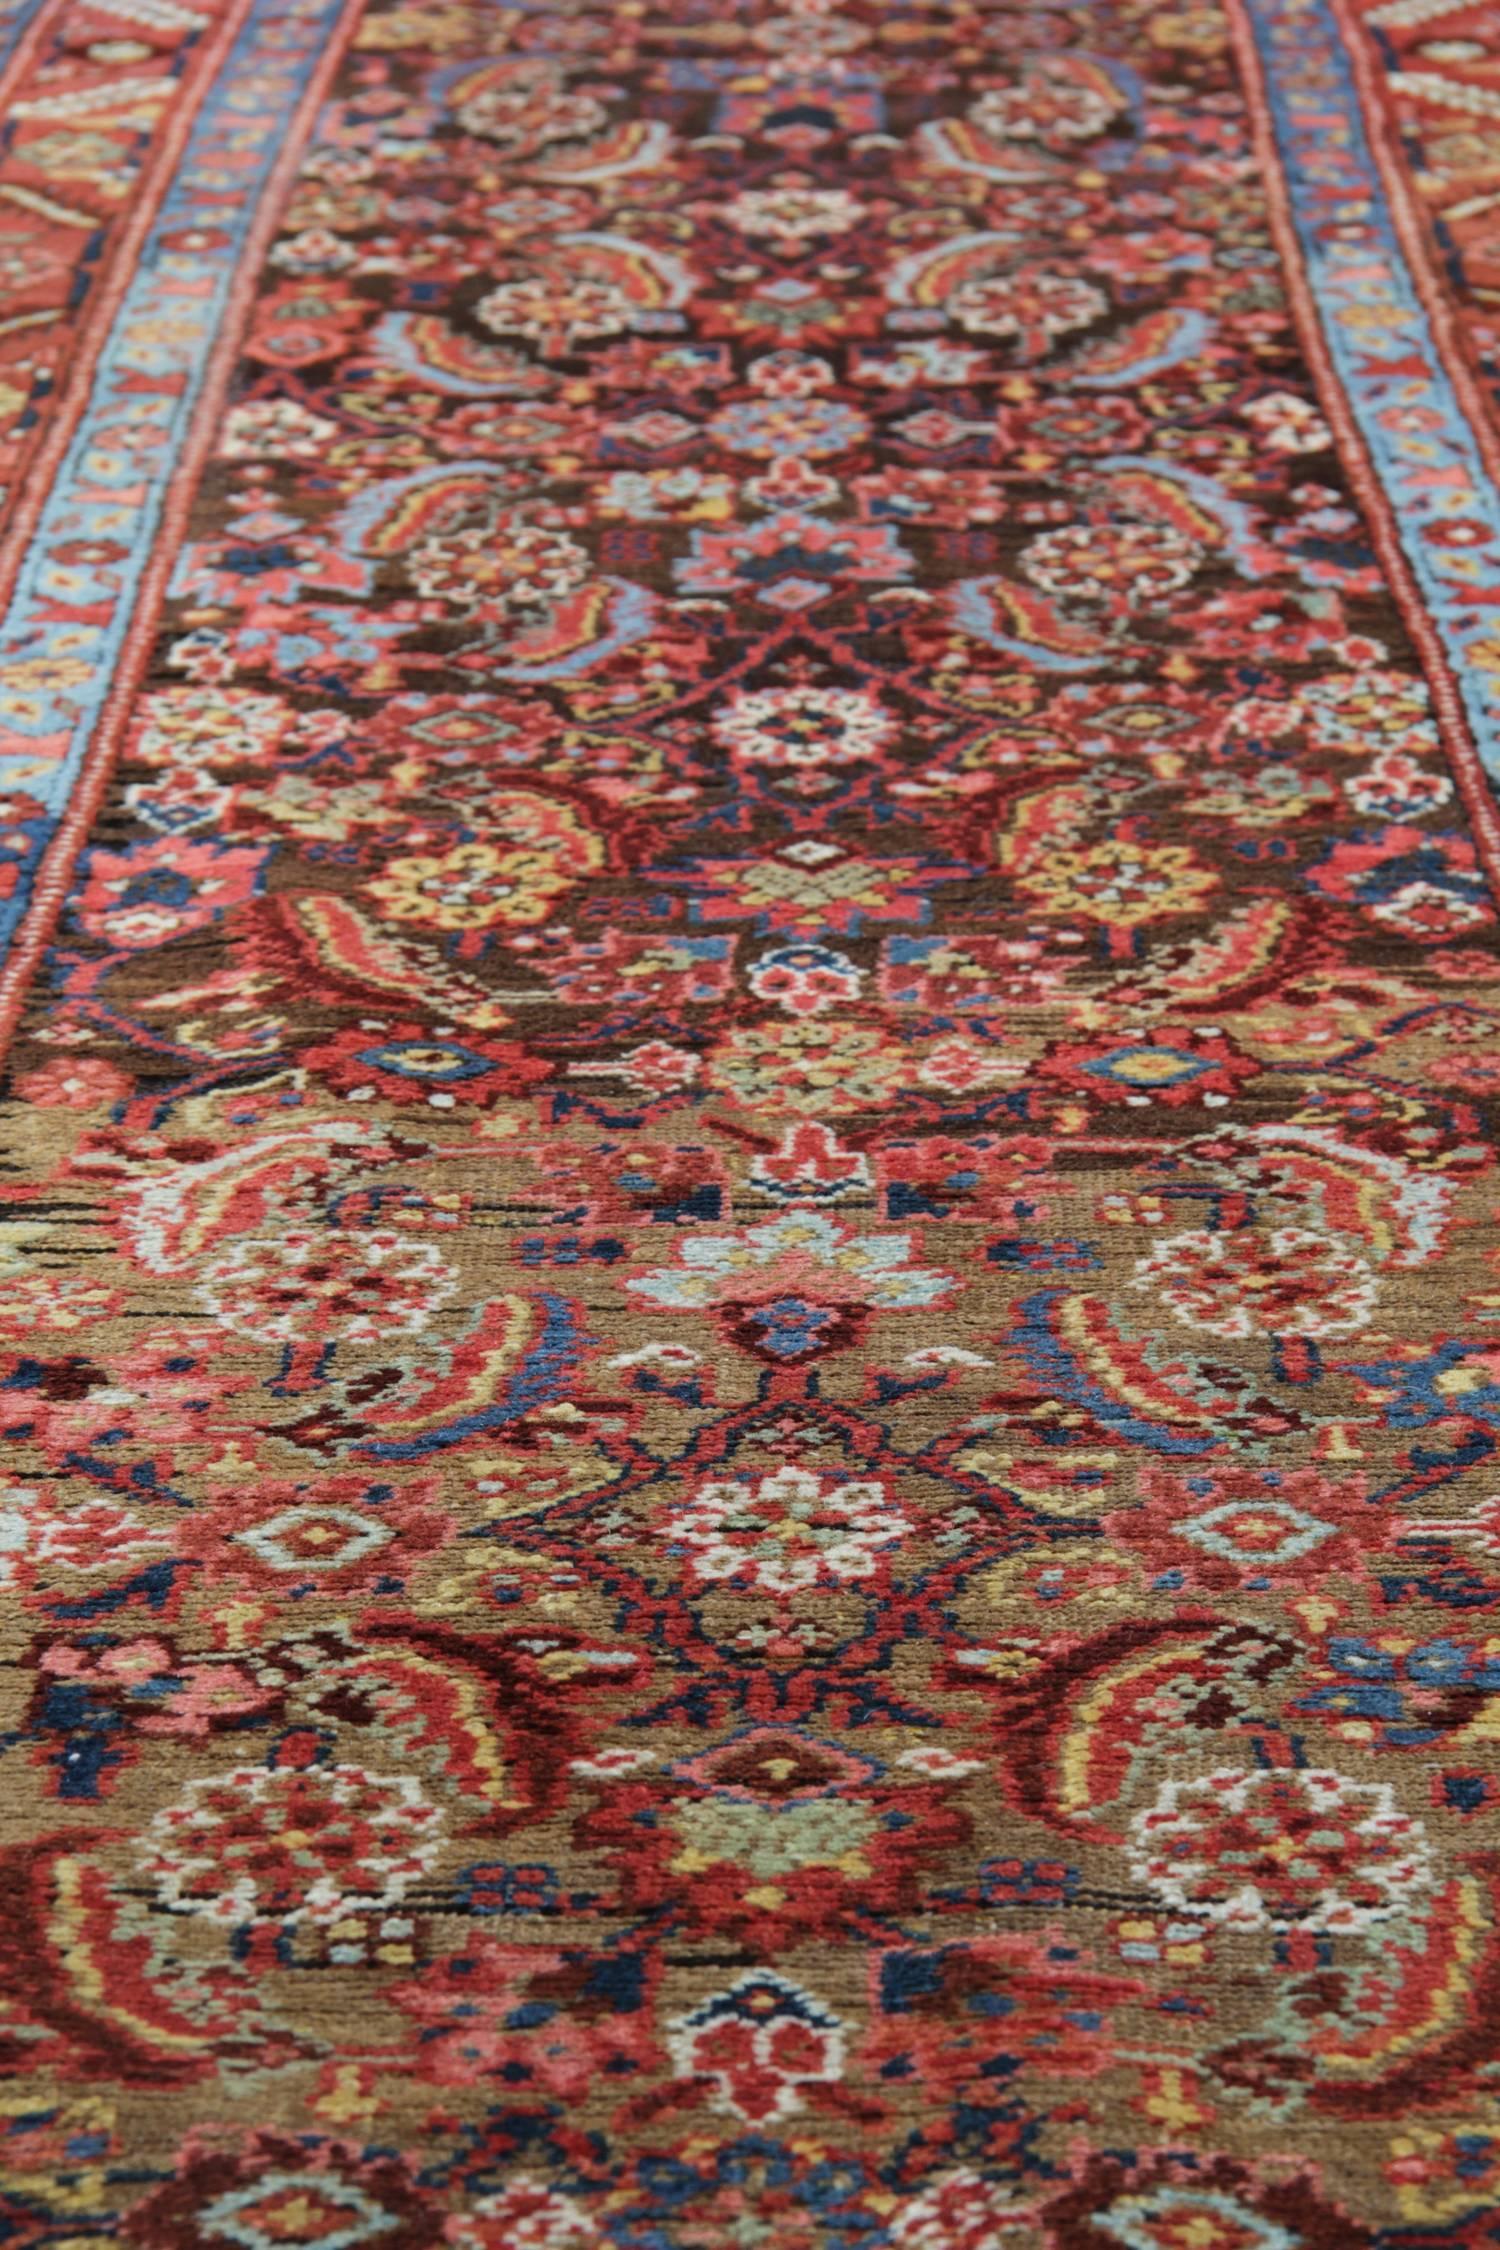 Vegetable Dyed Antique Carpet Runners, Persian Kurdish Stair Runner Rugs  For Sale